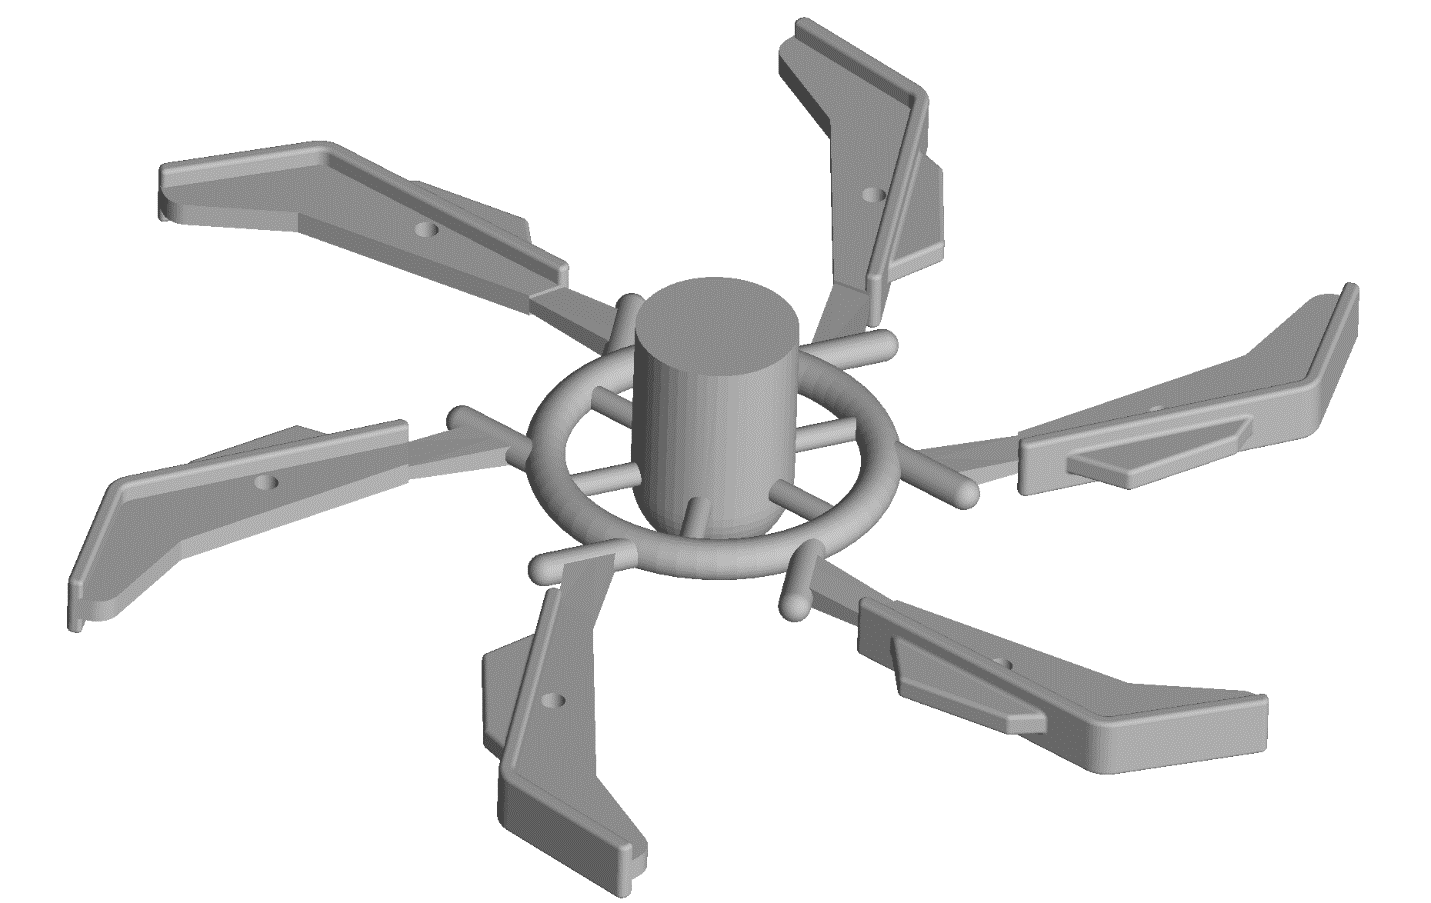 Centrifuge casting mold